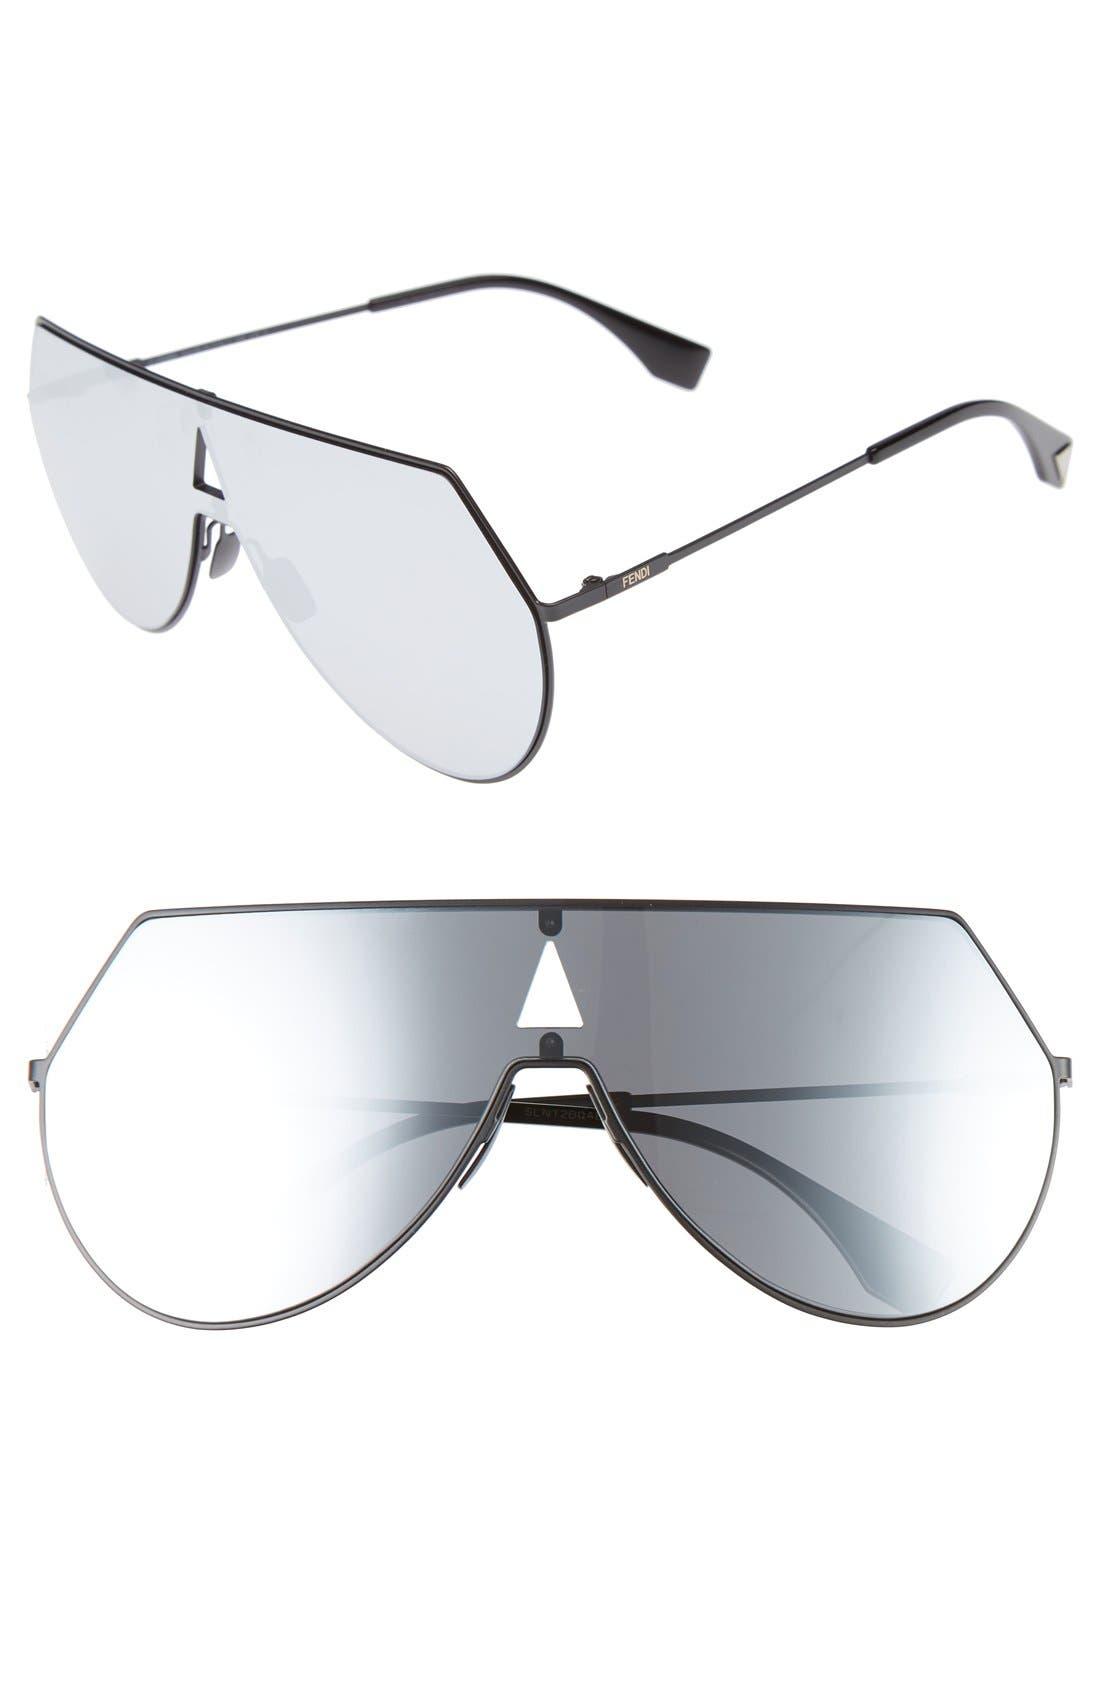 99mm Eyeline Aviator Sunglasses,                         Main,                         color, MATTE BLACK